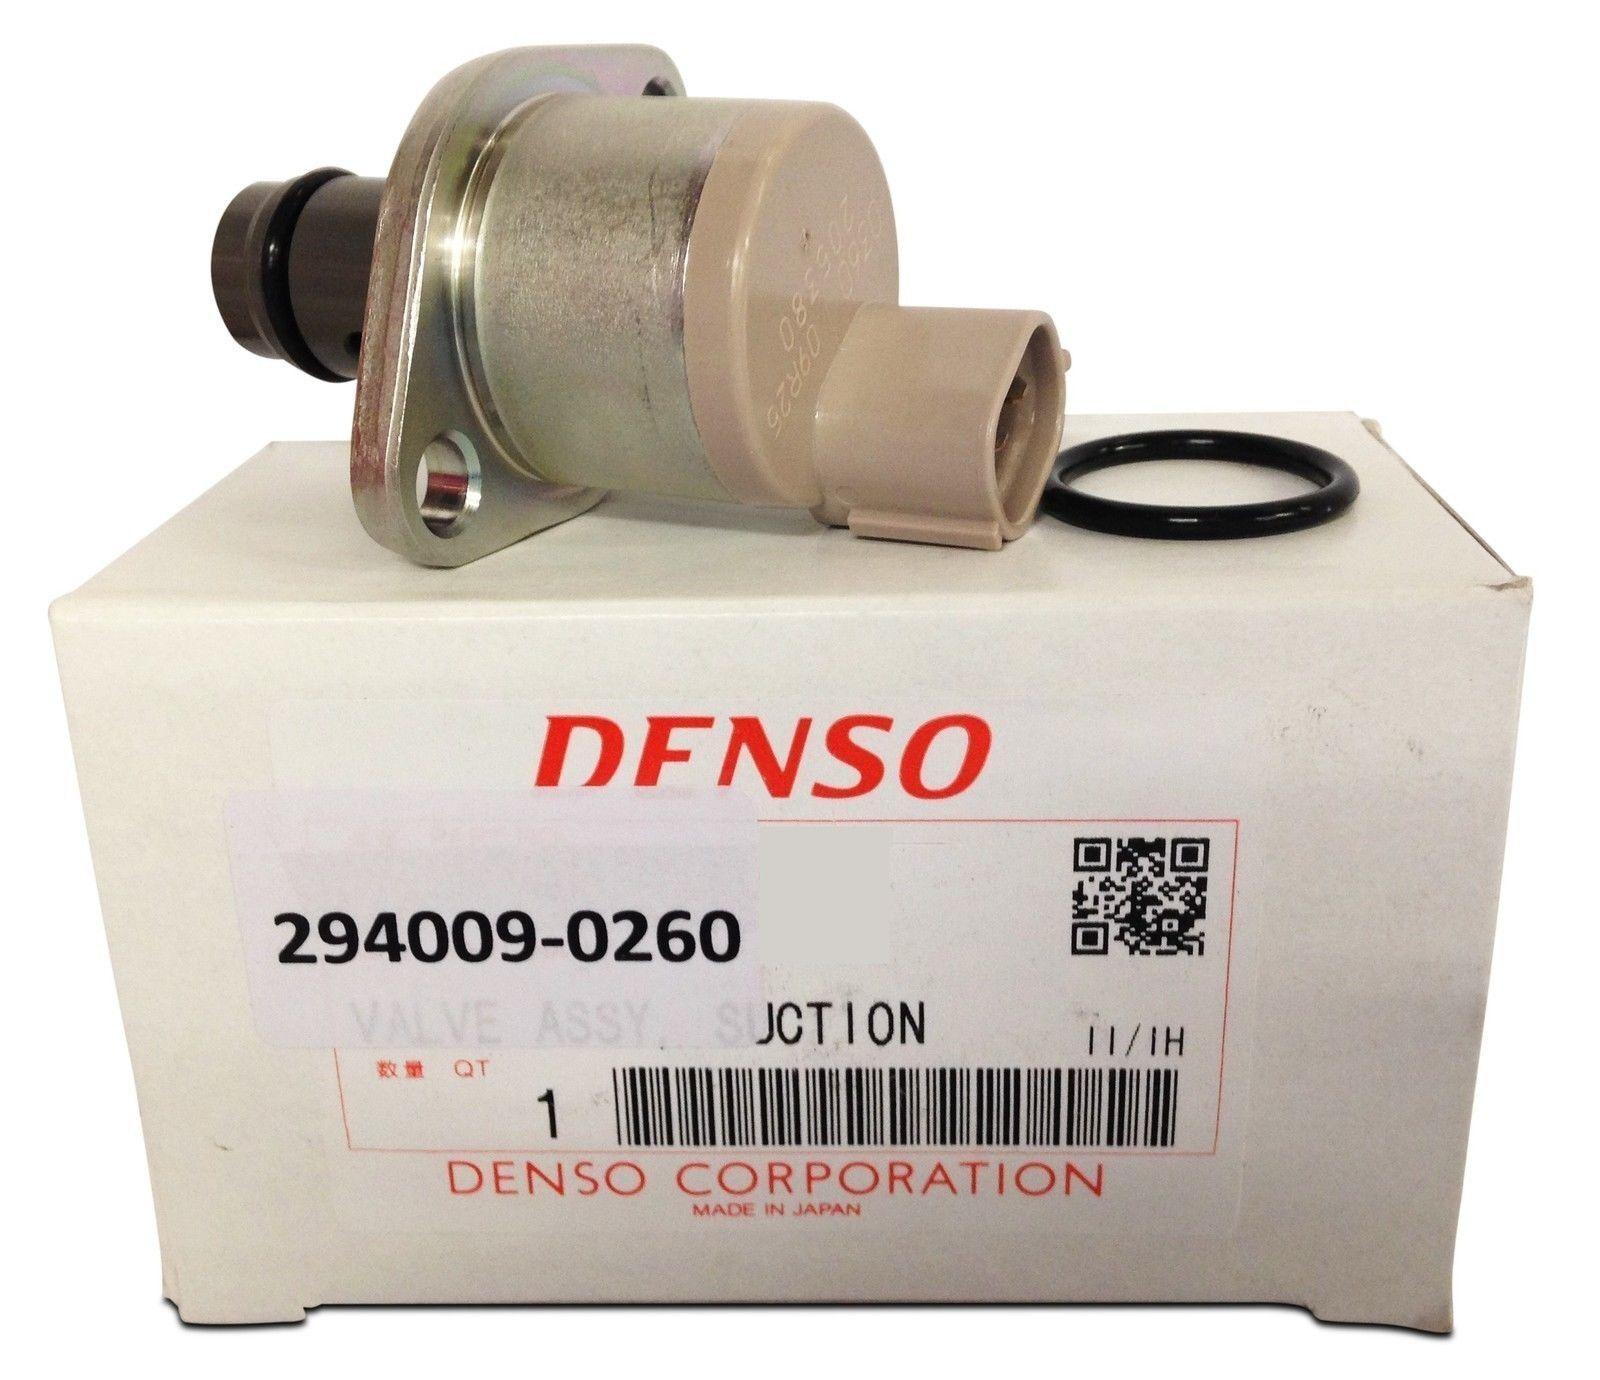 +FORD TRANSIT MK7 2006-14 2.2 2.4 3.2 L ENGINES FUEL TANK SENDER PUMP BP998-182